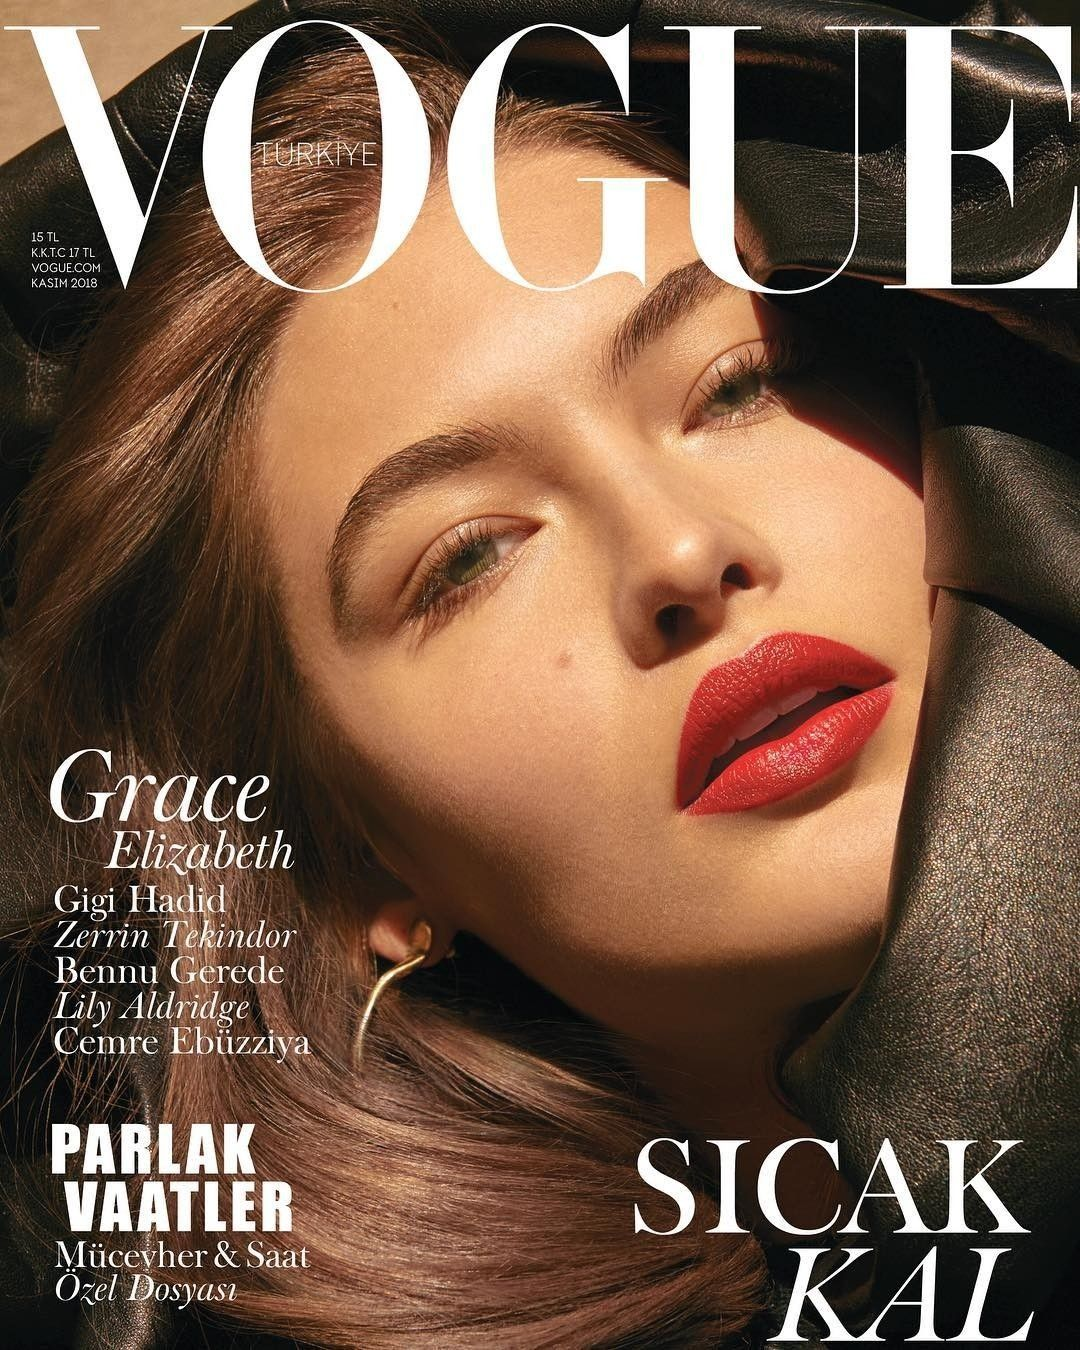 Festive top 5 flashback fashion magazine covers photo